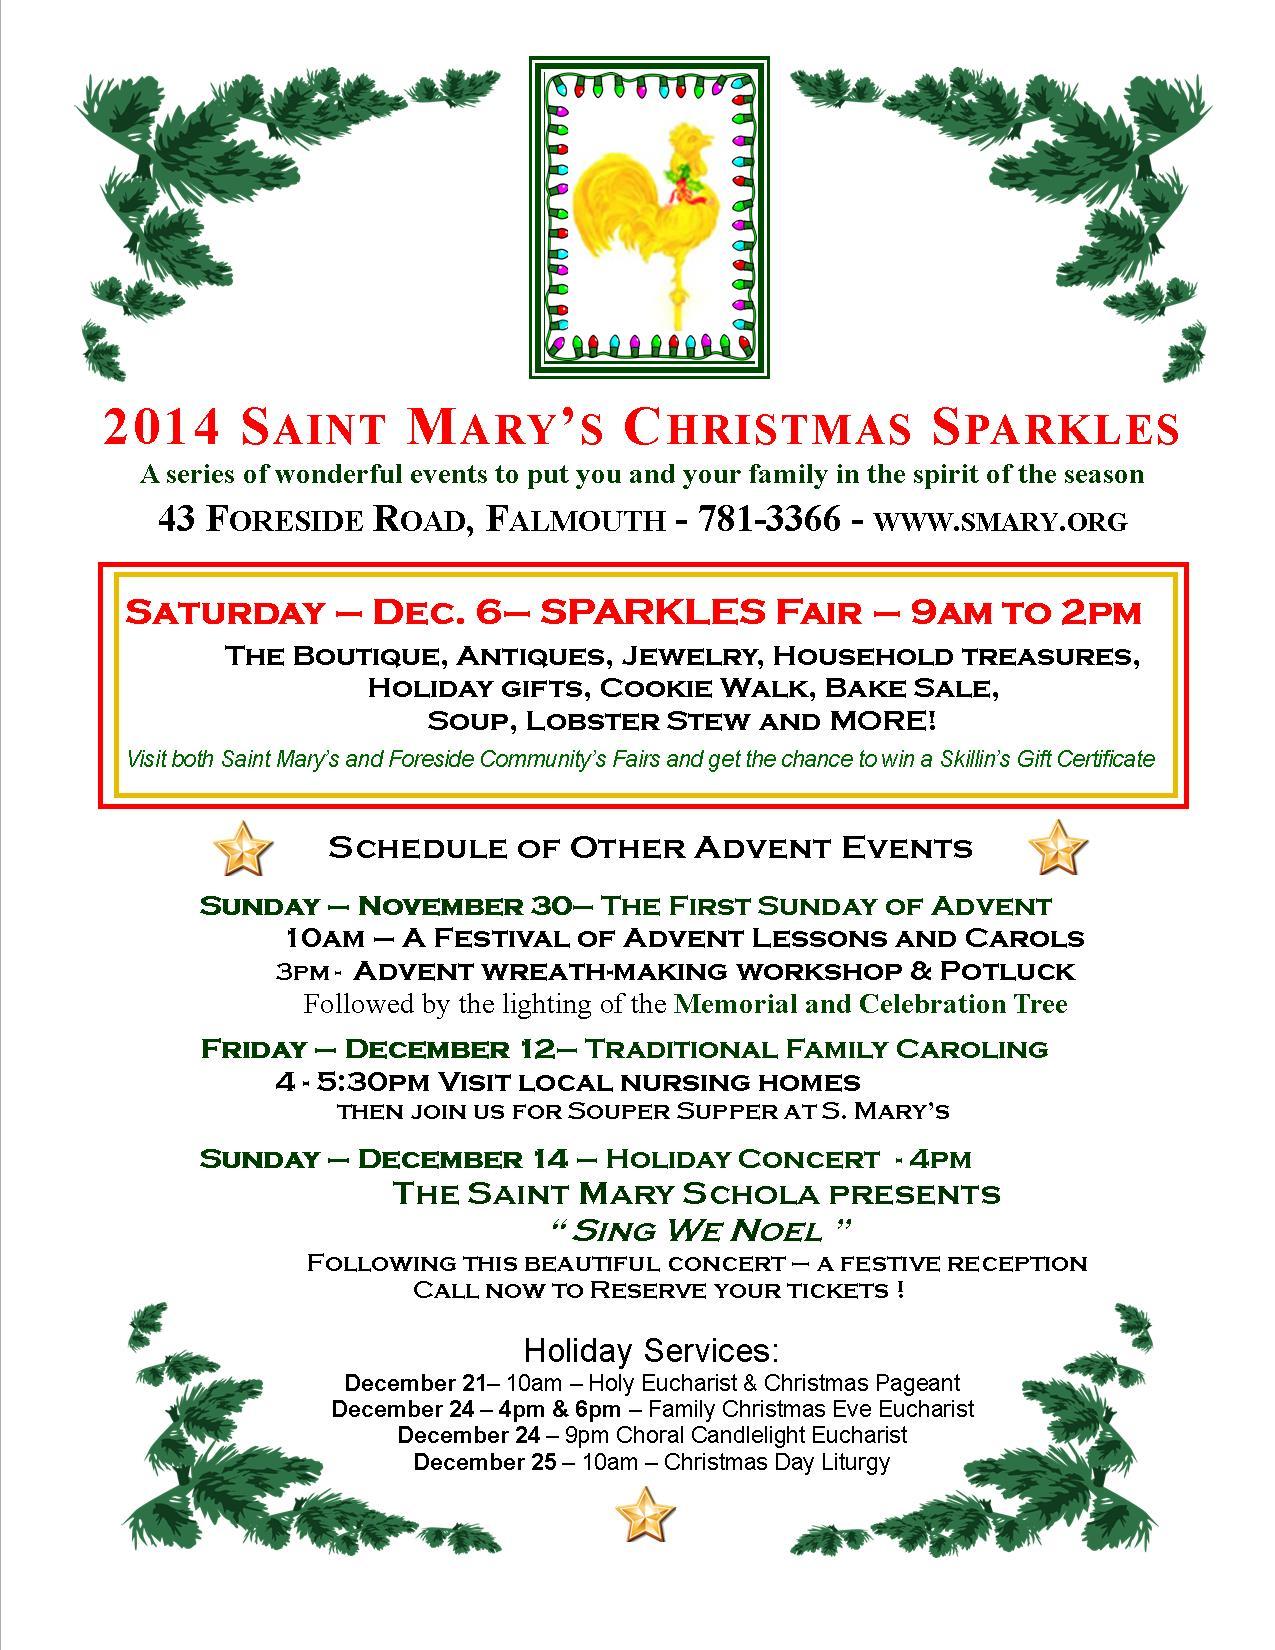 Sparkles Poster 2014